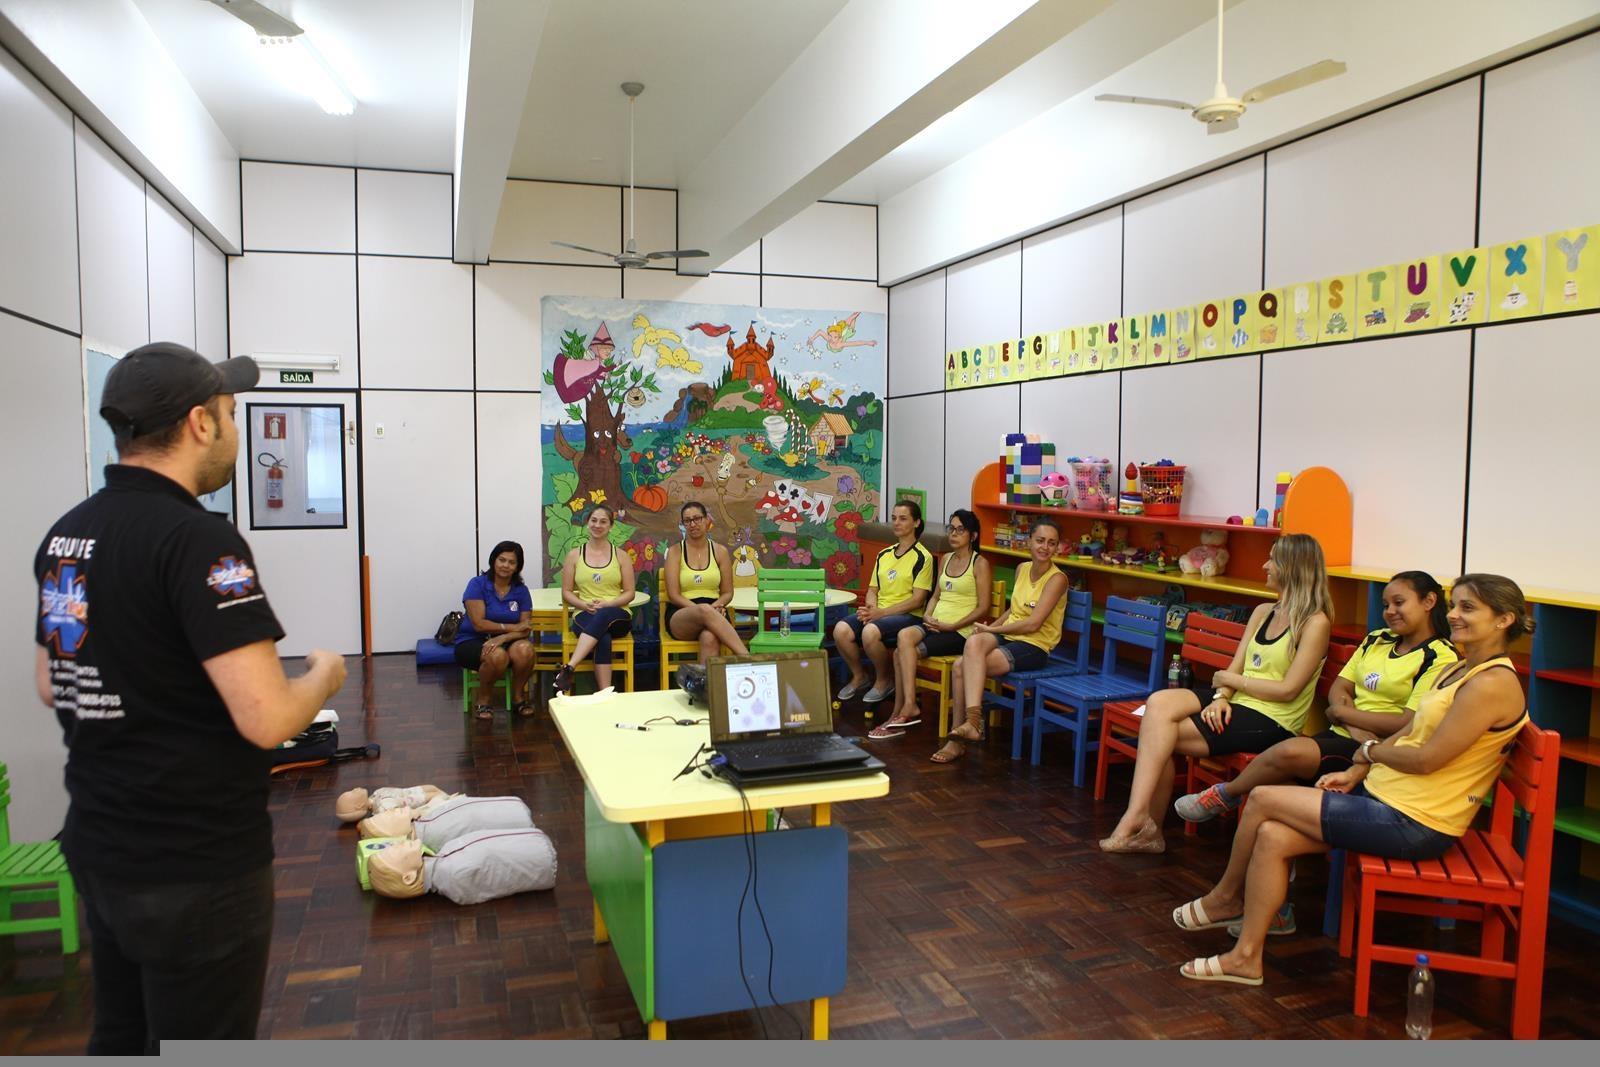 Escola Doritos - Aulas de primeiros socorros